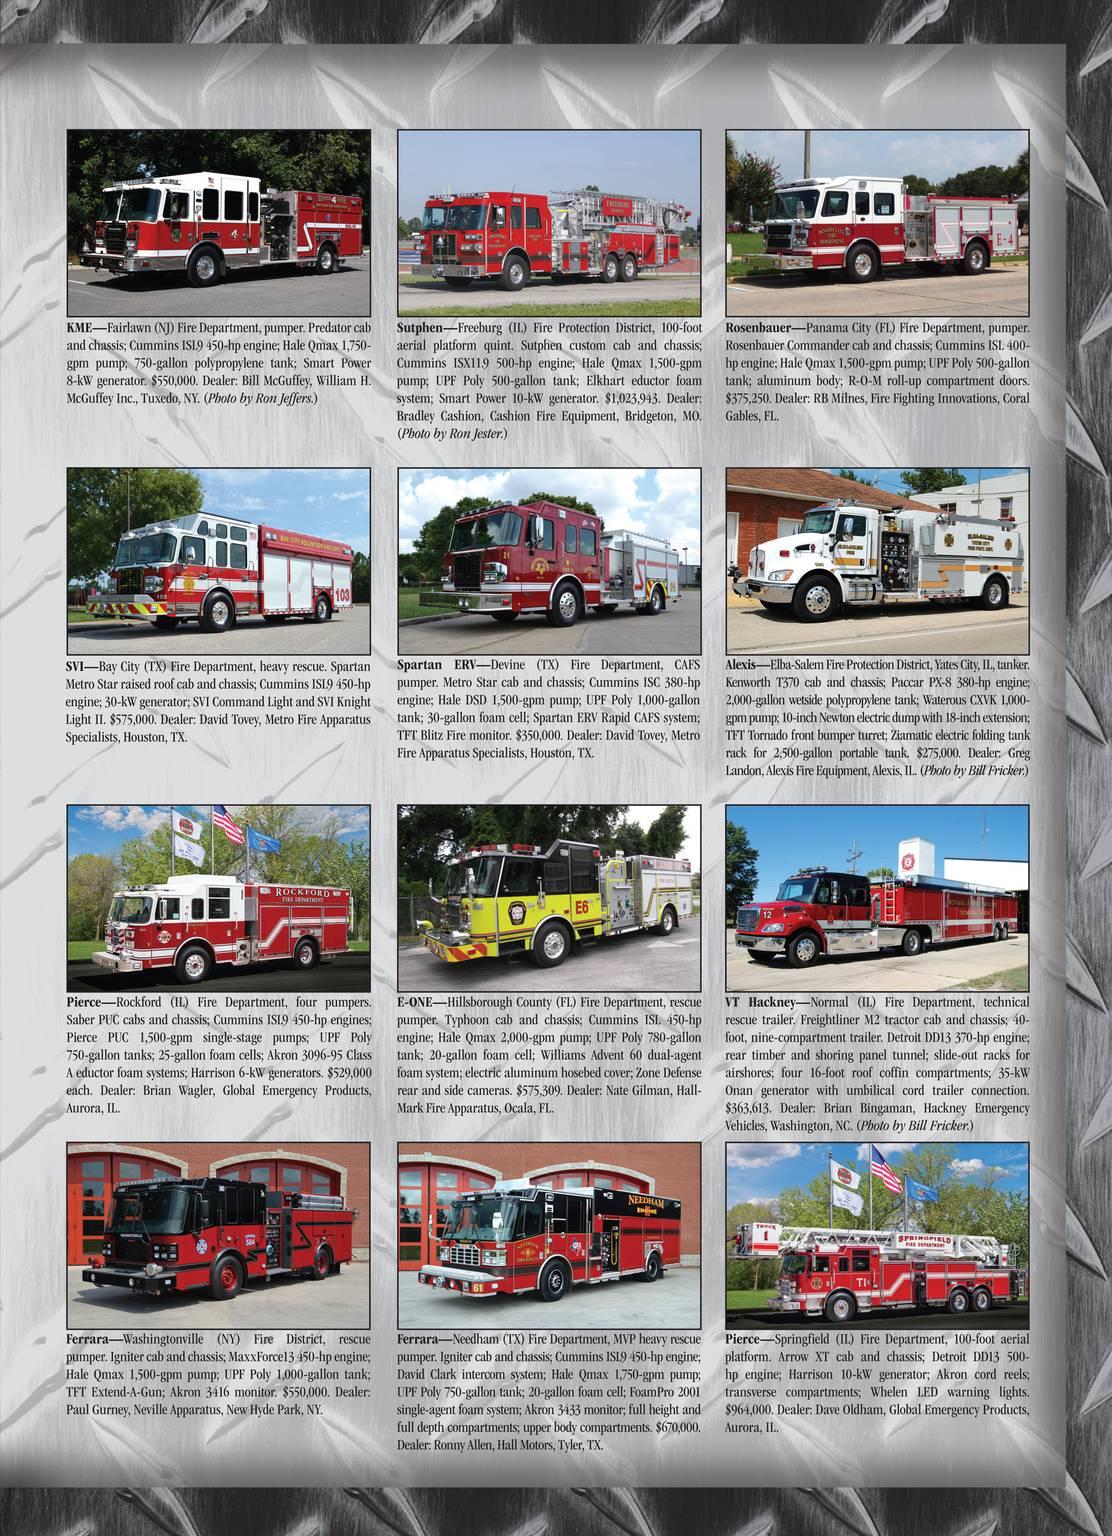 Fire Apparatus Magazine - December 2013 - page 46